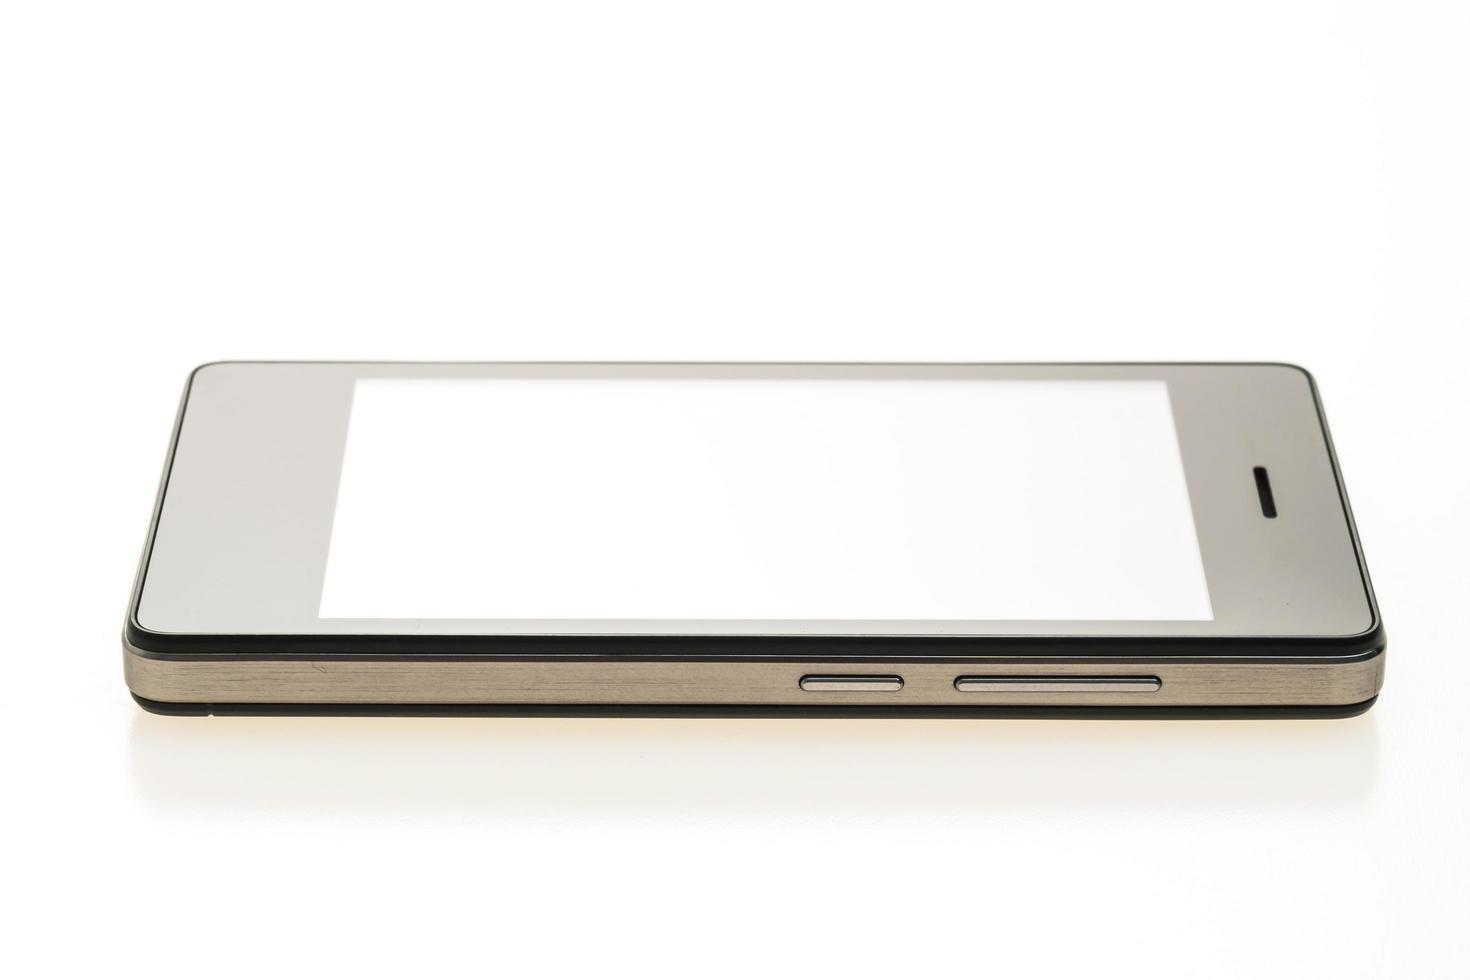 smartphone op witte achtergrond foto